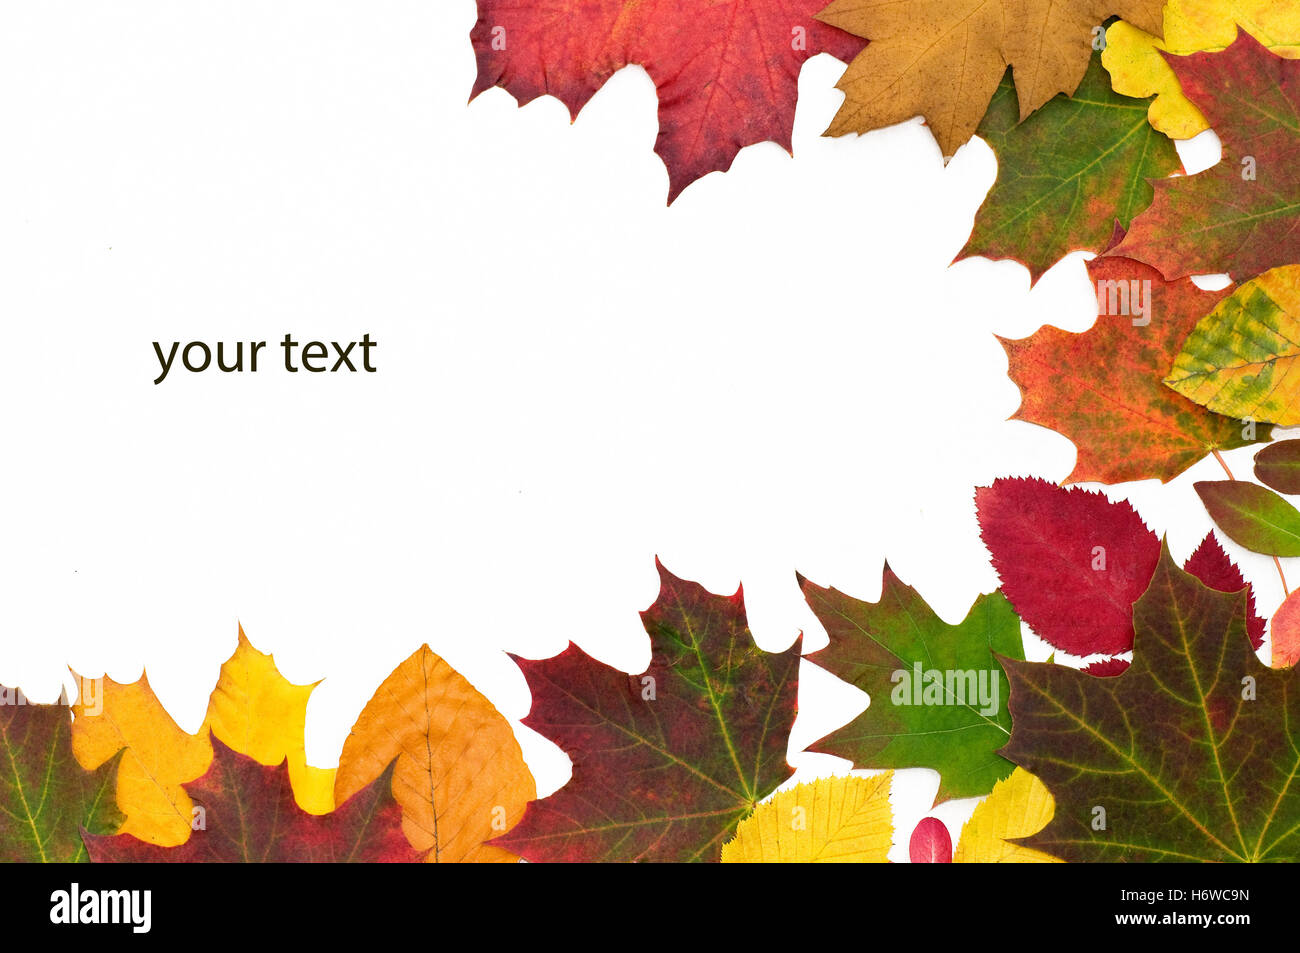 autumnal yourtext - Stock Image